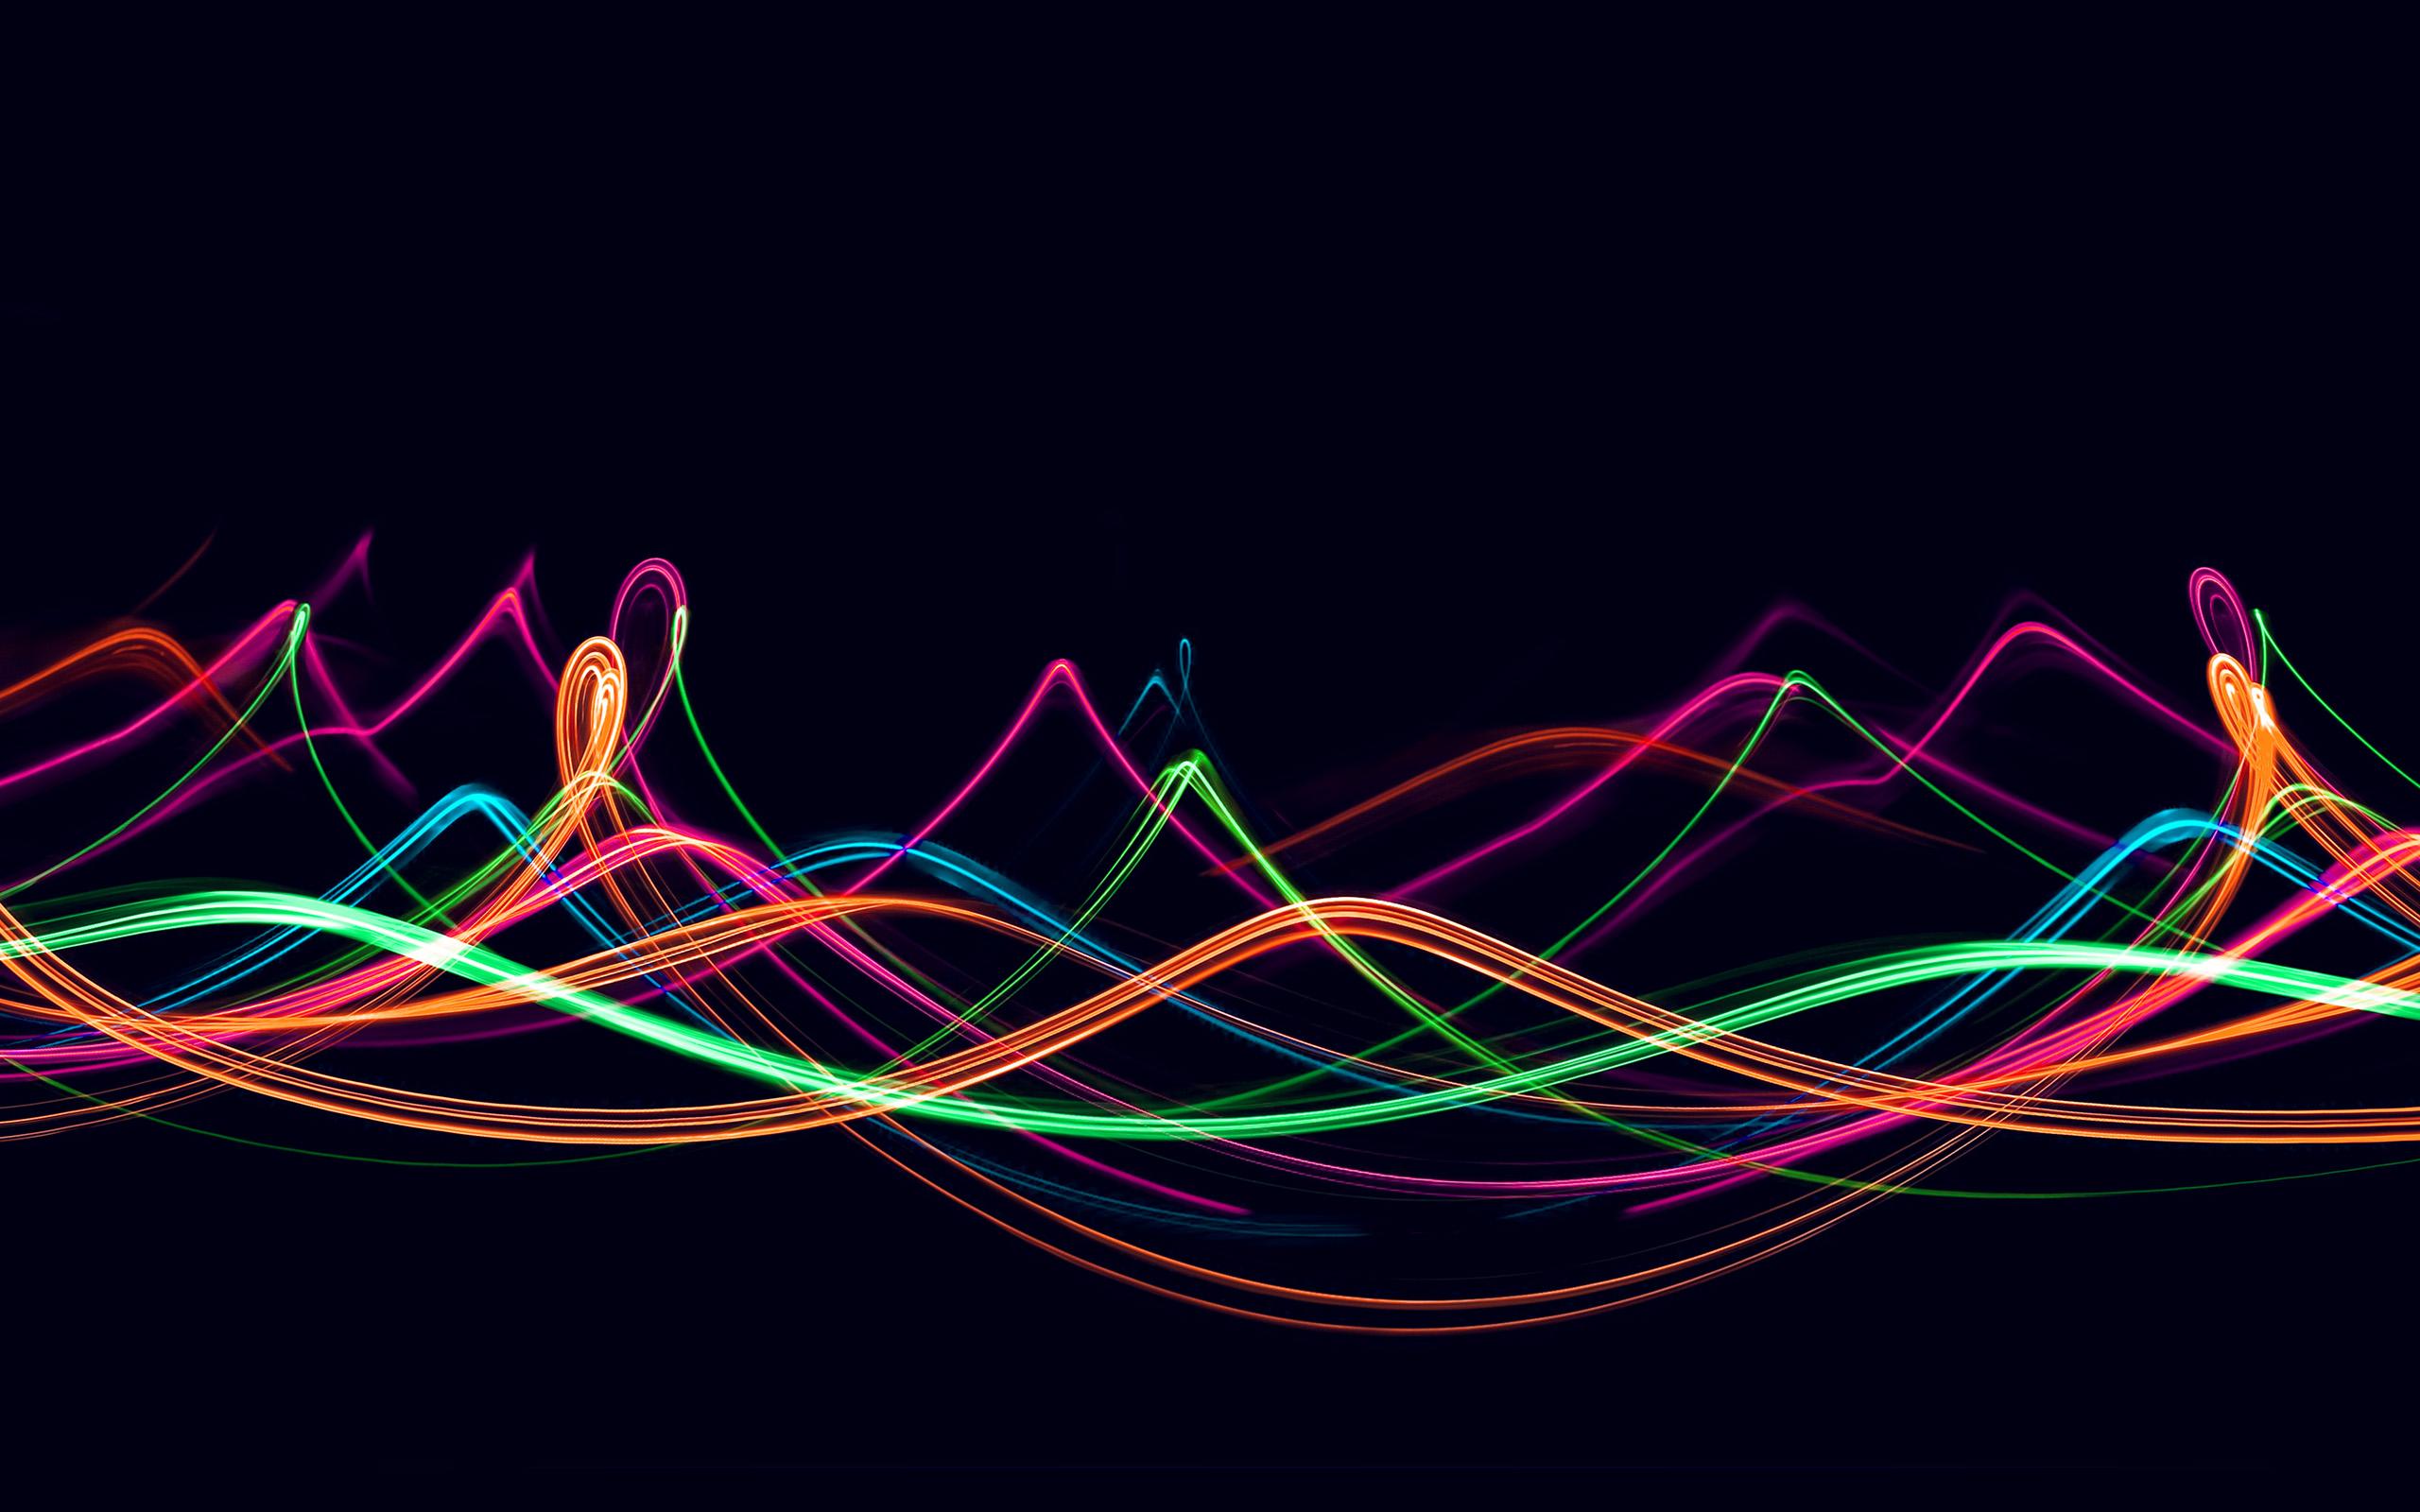 wallpaper for desktop, laptop | vn49-abstract-curve-lines ...